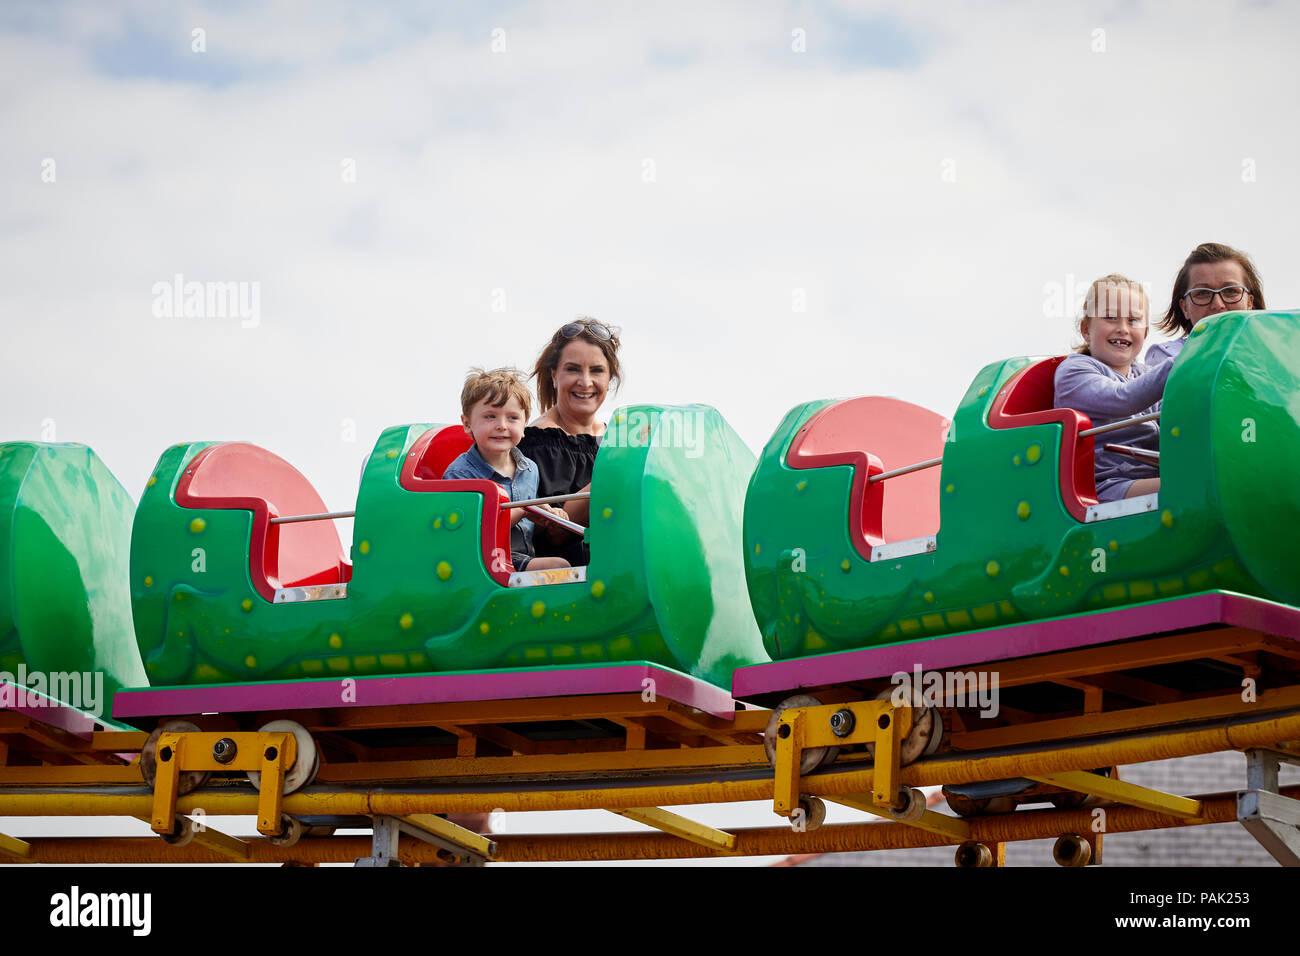 Rhyl seaside coastal resort town Denbighshire, north Wales. Historically  Flintshire, Nessi small rollercoaster ride on the promenade - Stock Image